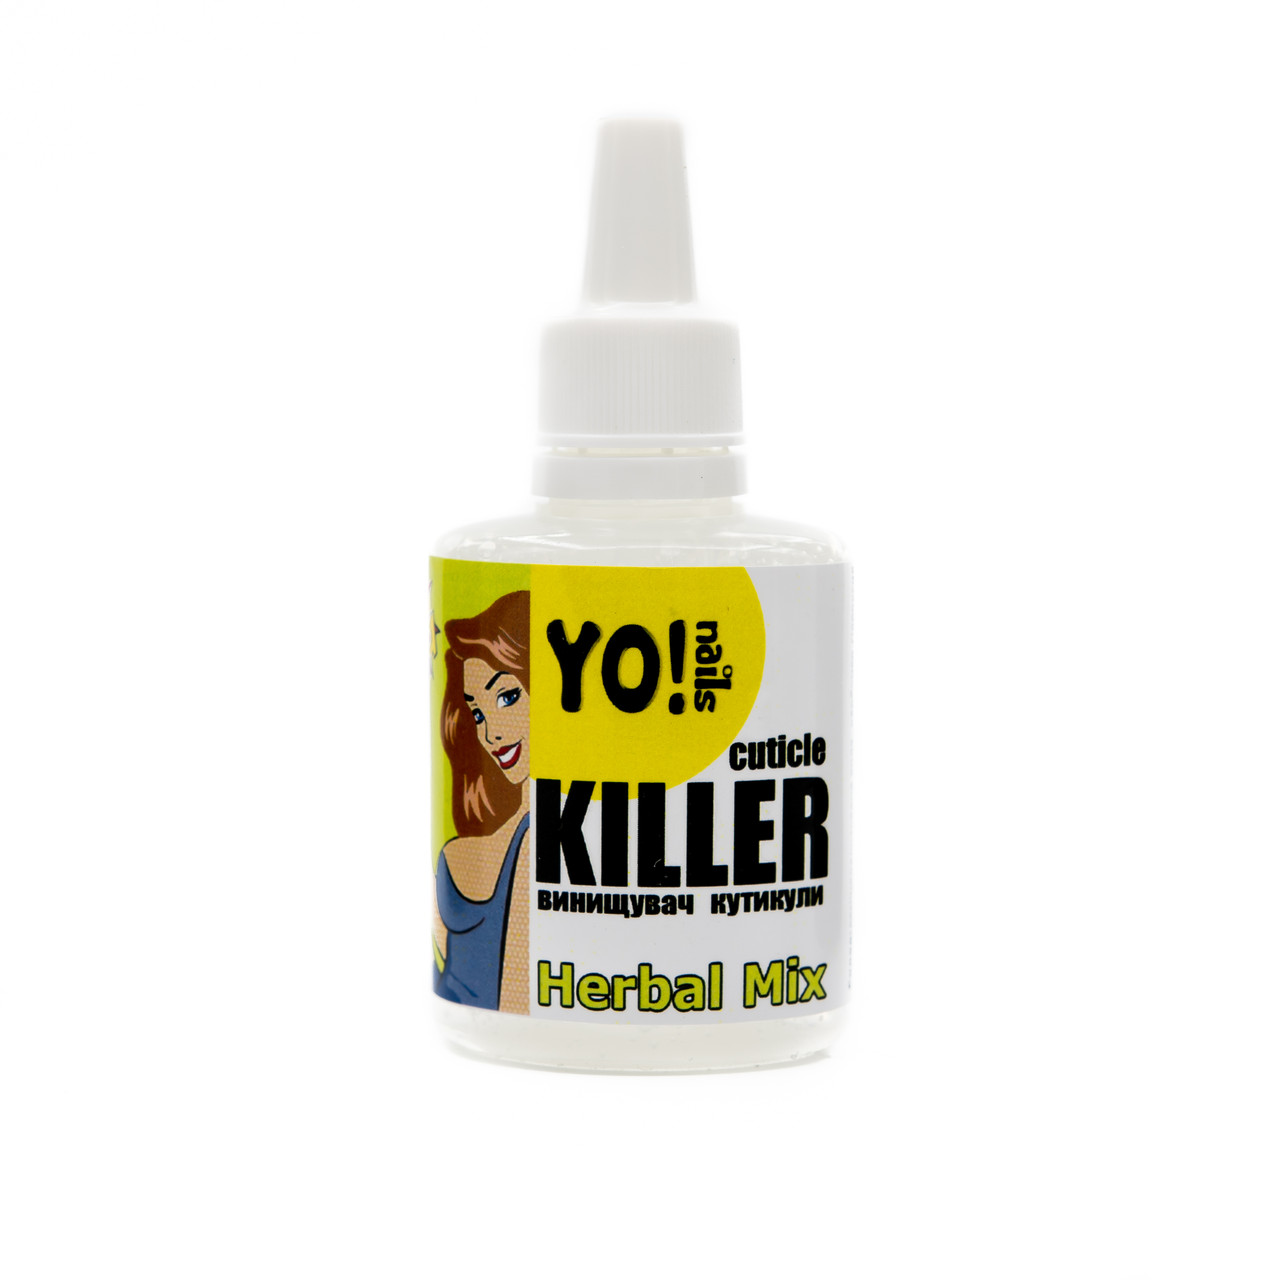 Ремувер для кутикулы, Yo!nails CUTICLE KILLER Herbal Mix